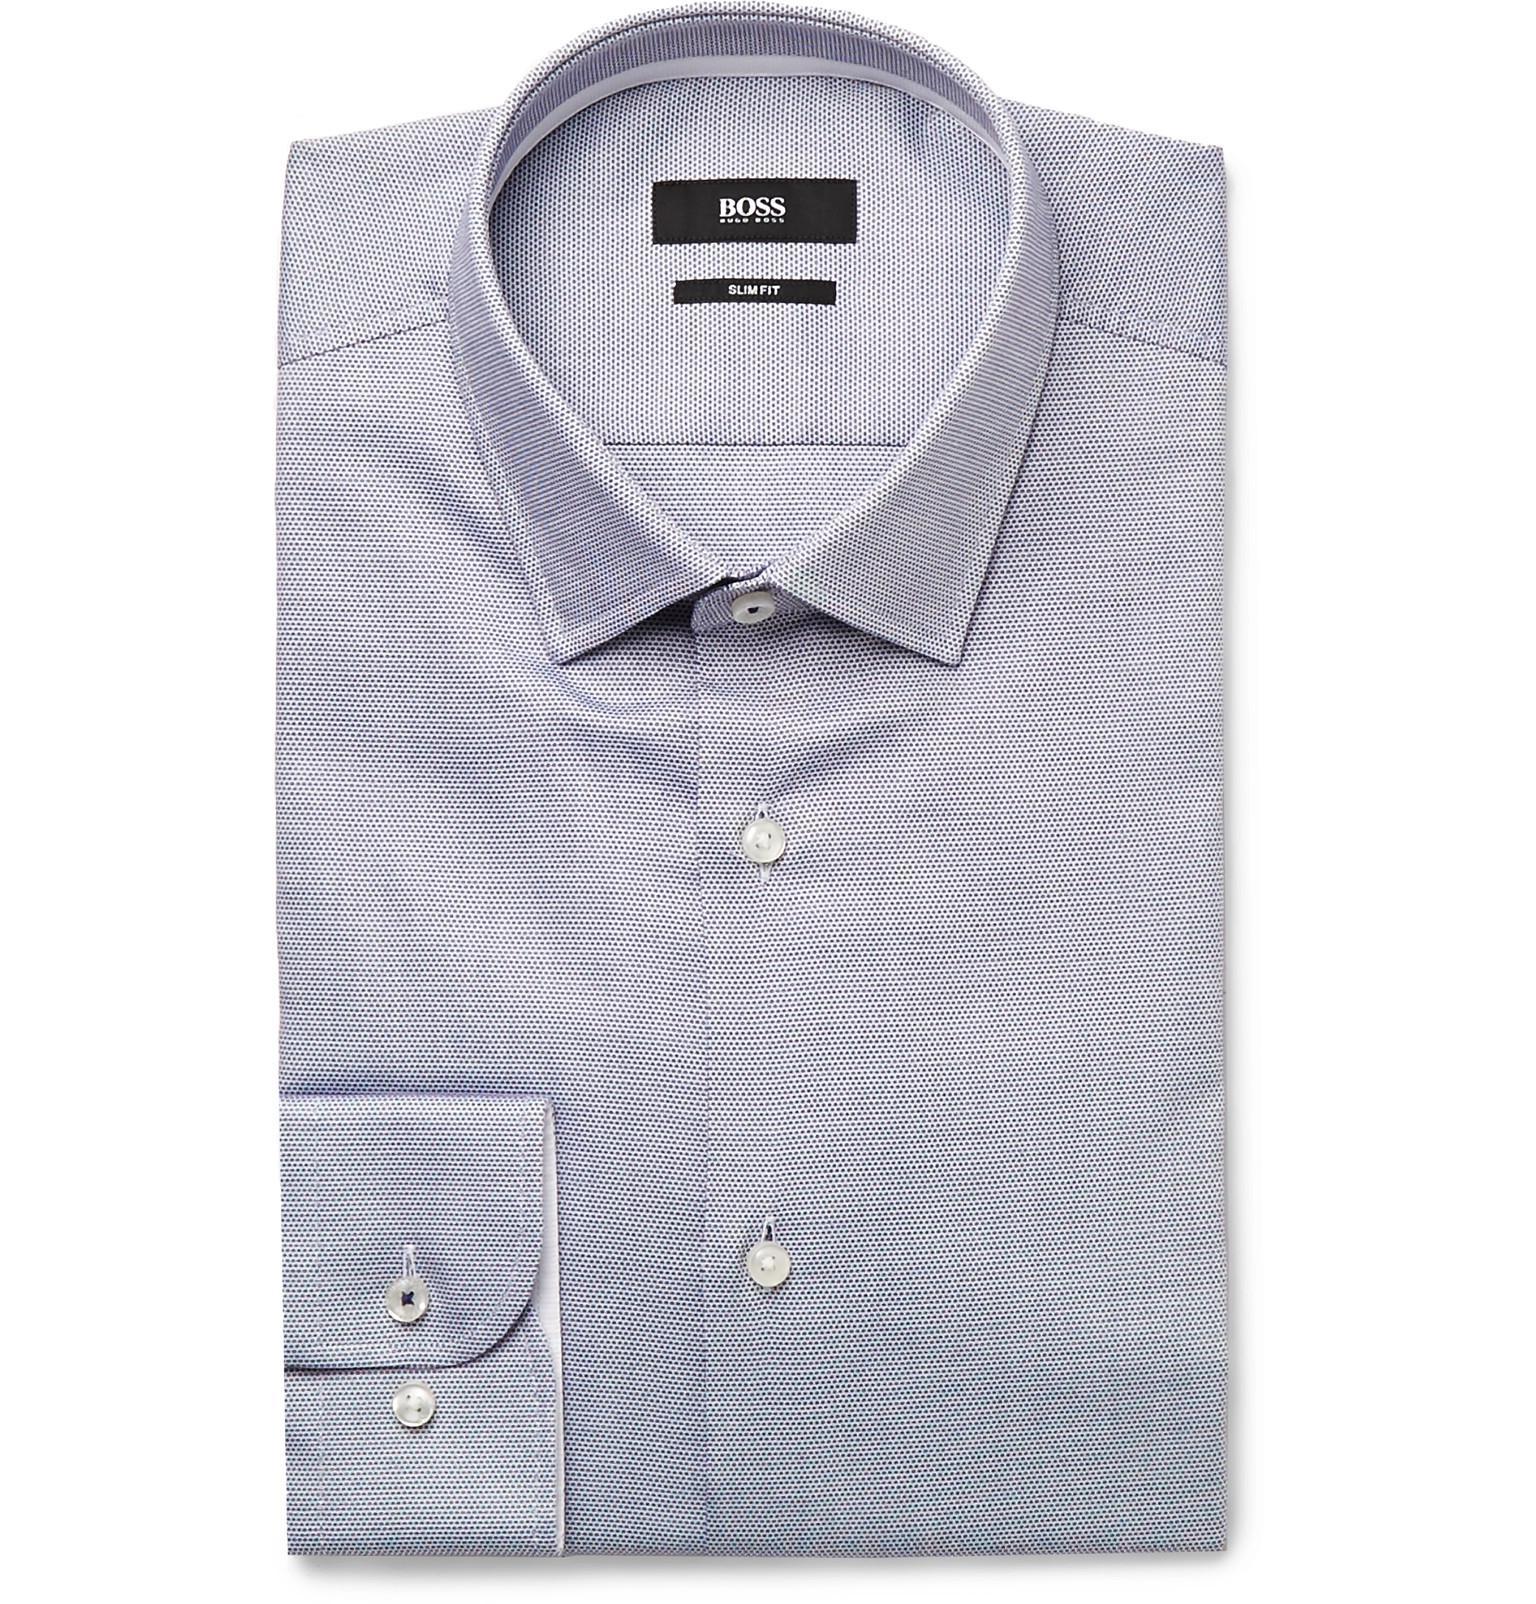 fd26931c6 BOSS - Blue Navy Jesse Slim-fit Polka-dot Cotton-poplin Shirt for. View  fullscreen